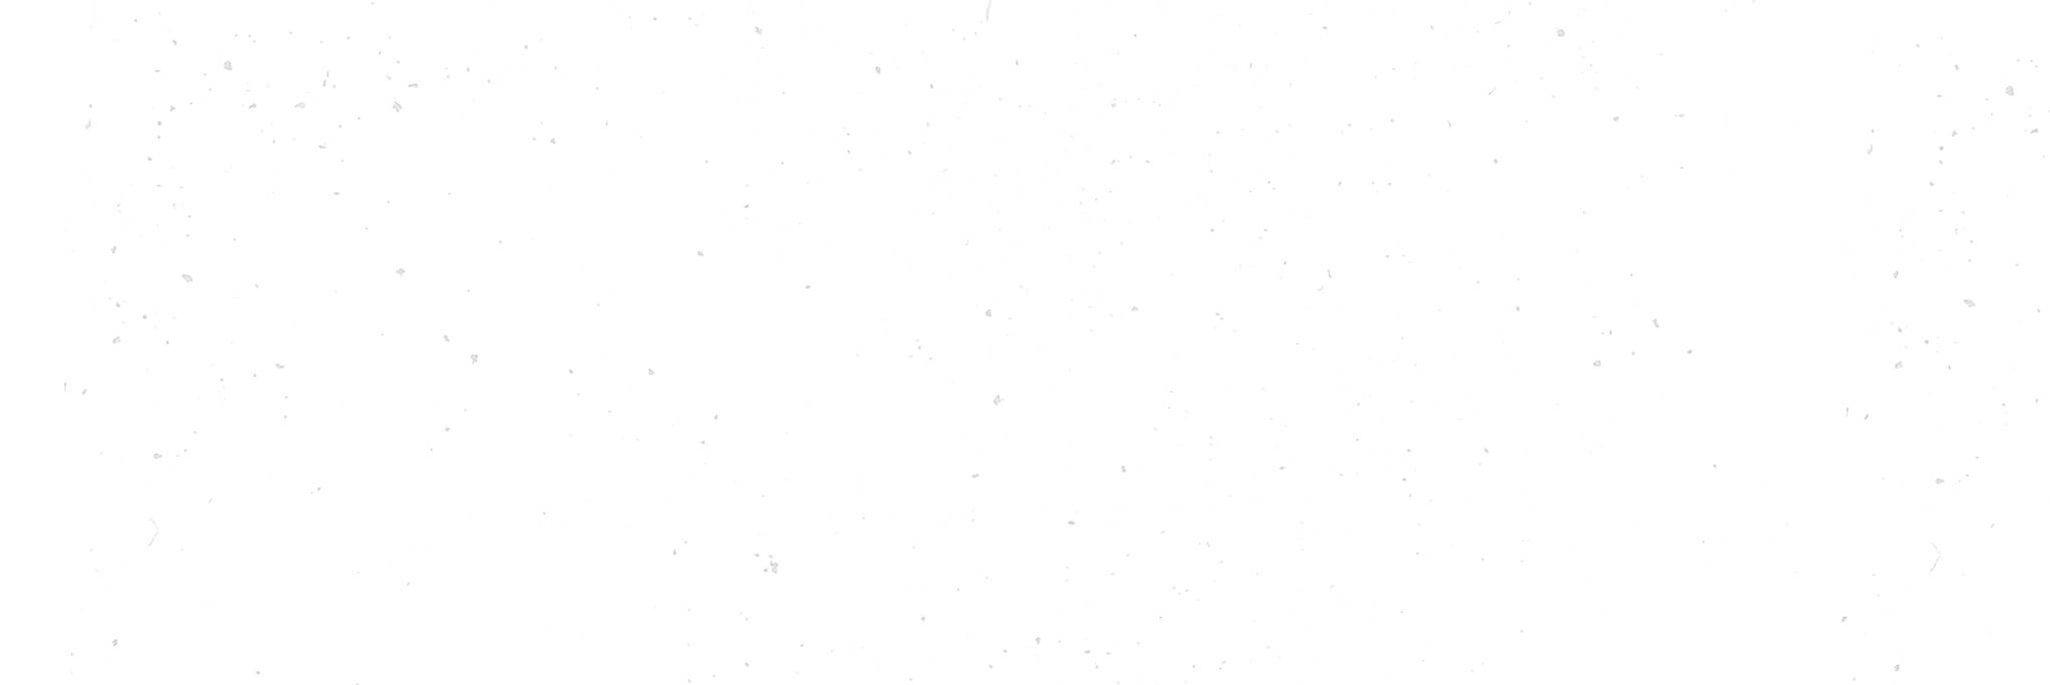 TO清修抗-SEC07-BC02=.jpg